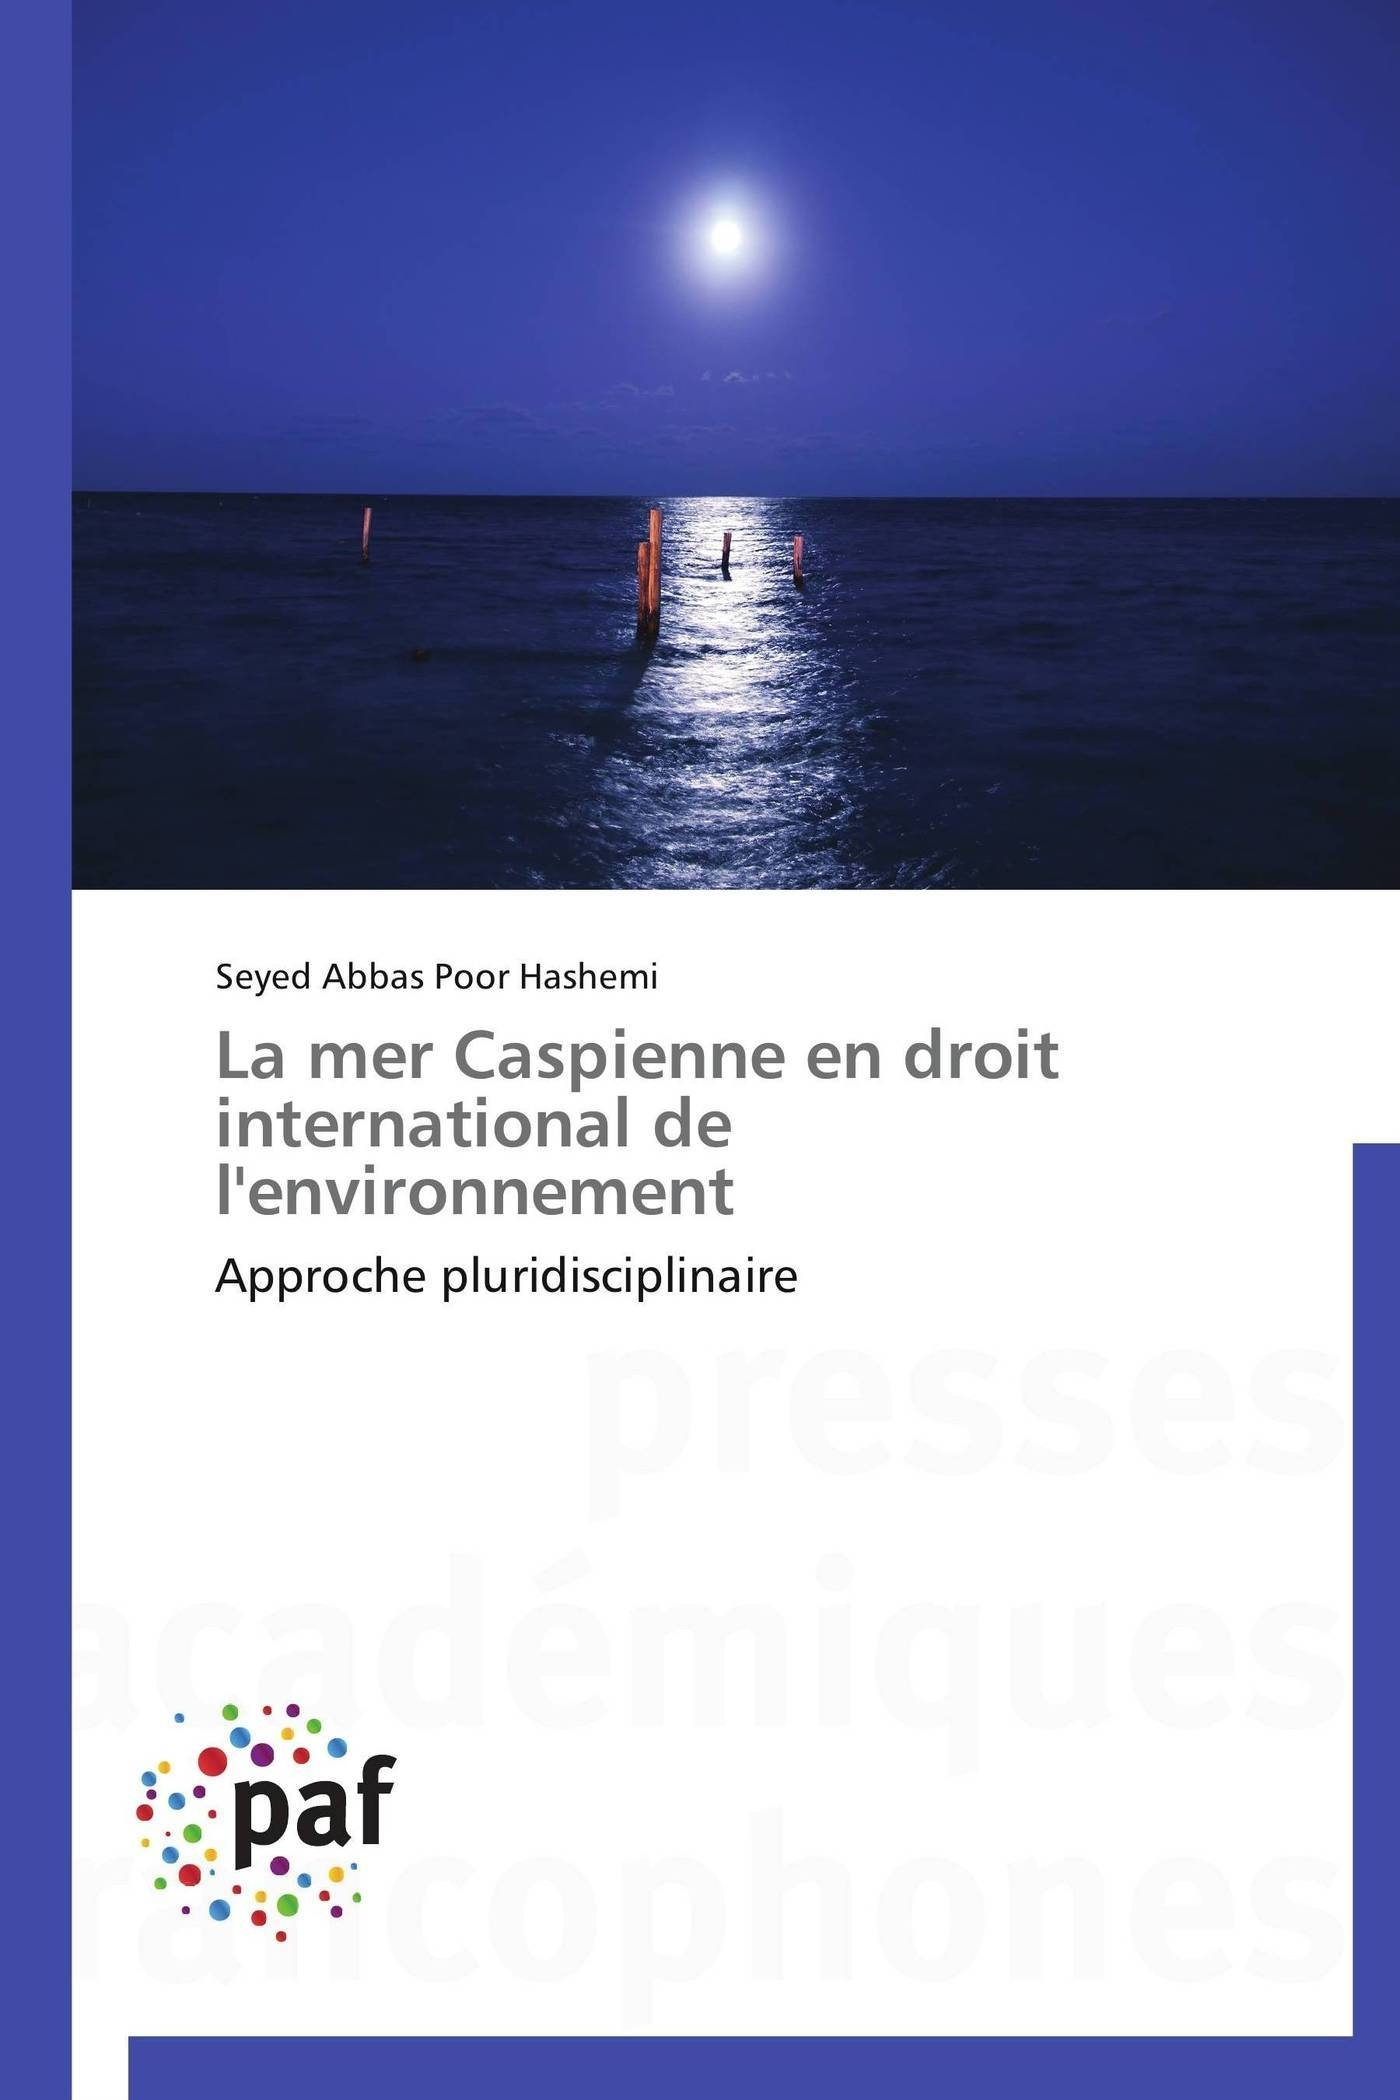 LA MER CASPIENNE EN DROIT INTERNATIONAL DE L'ENVIRONNEMENT